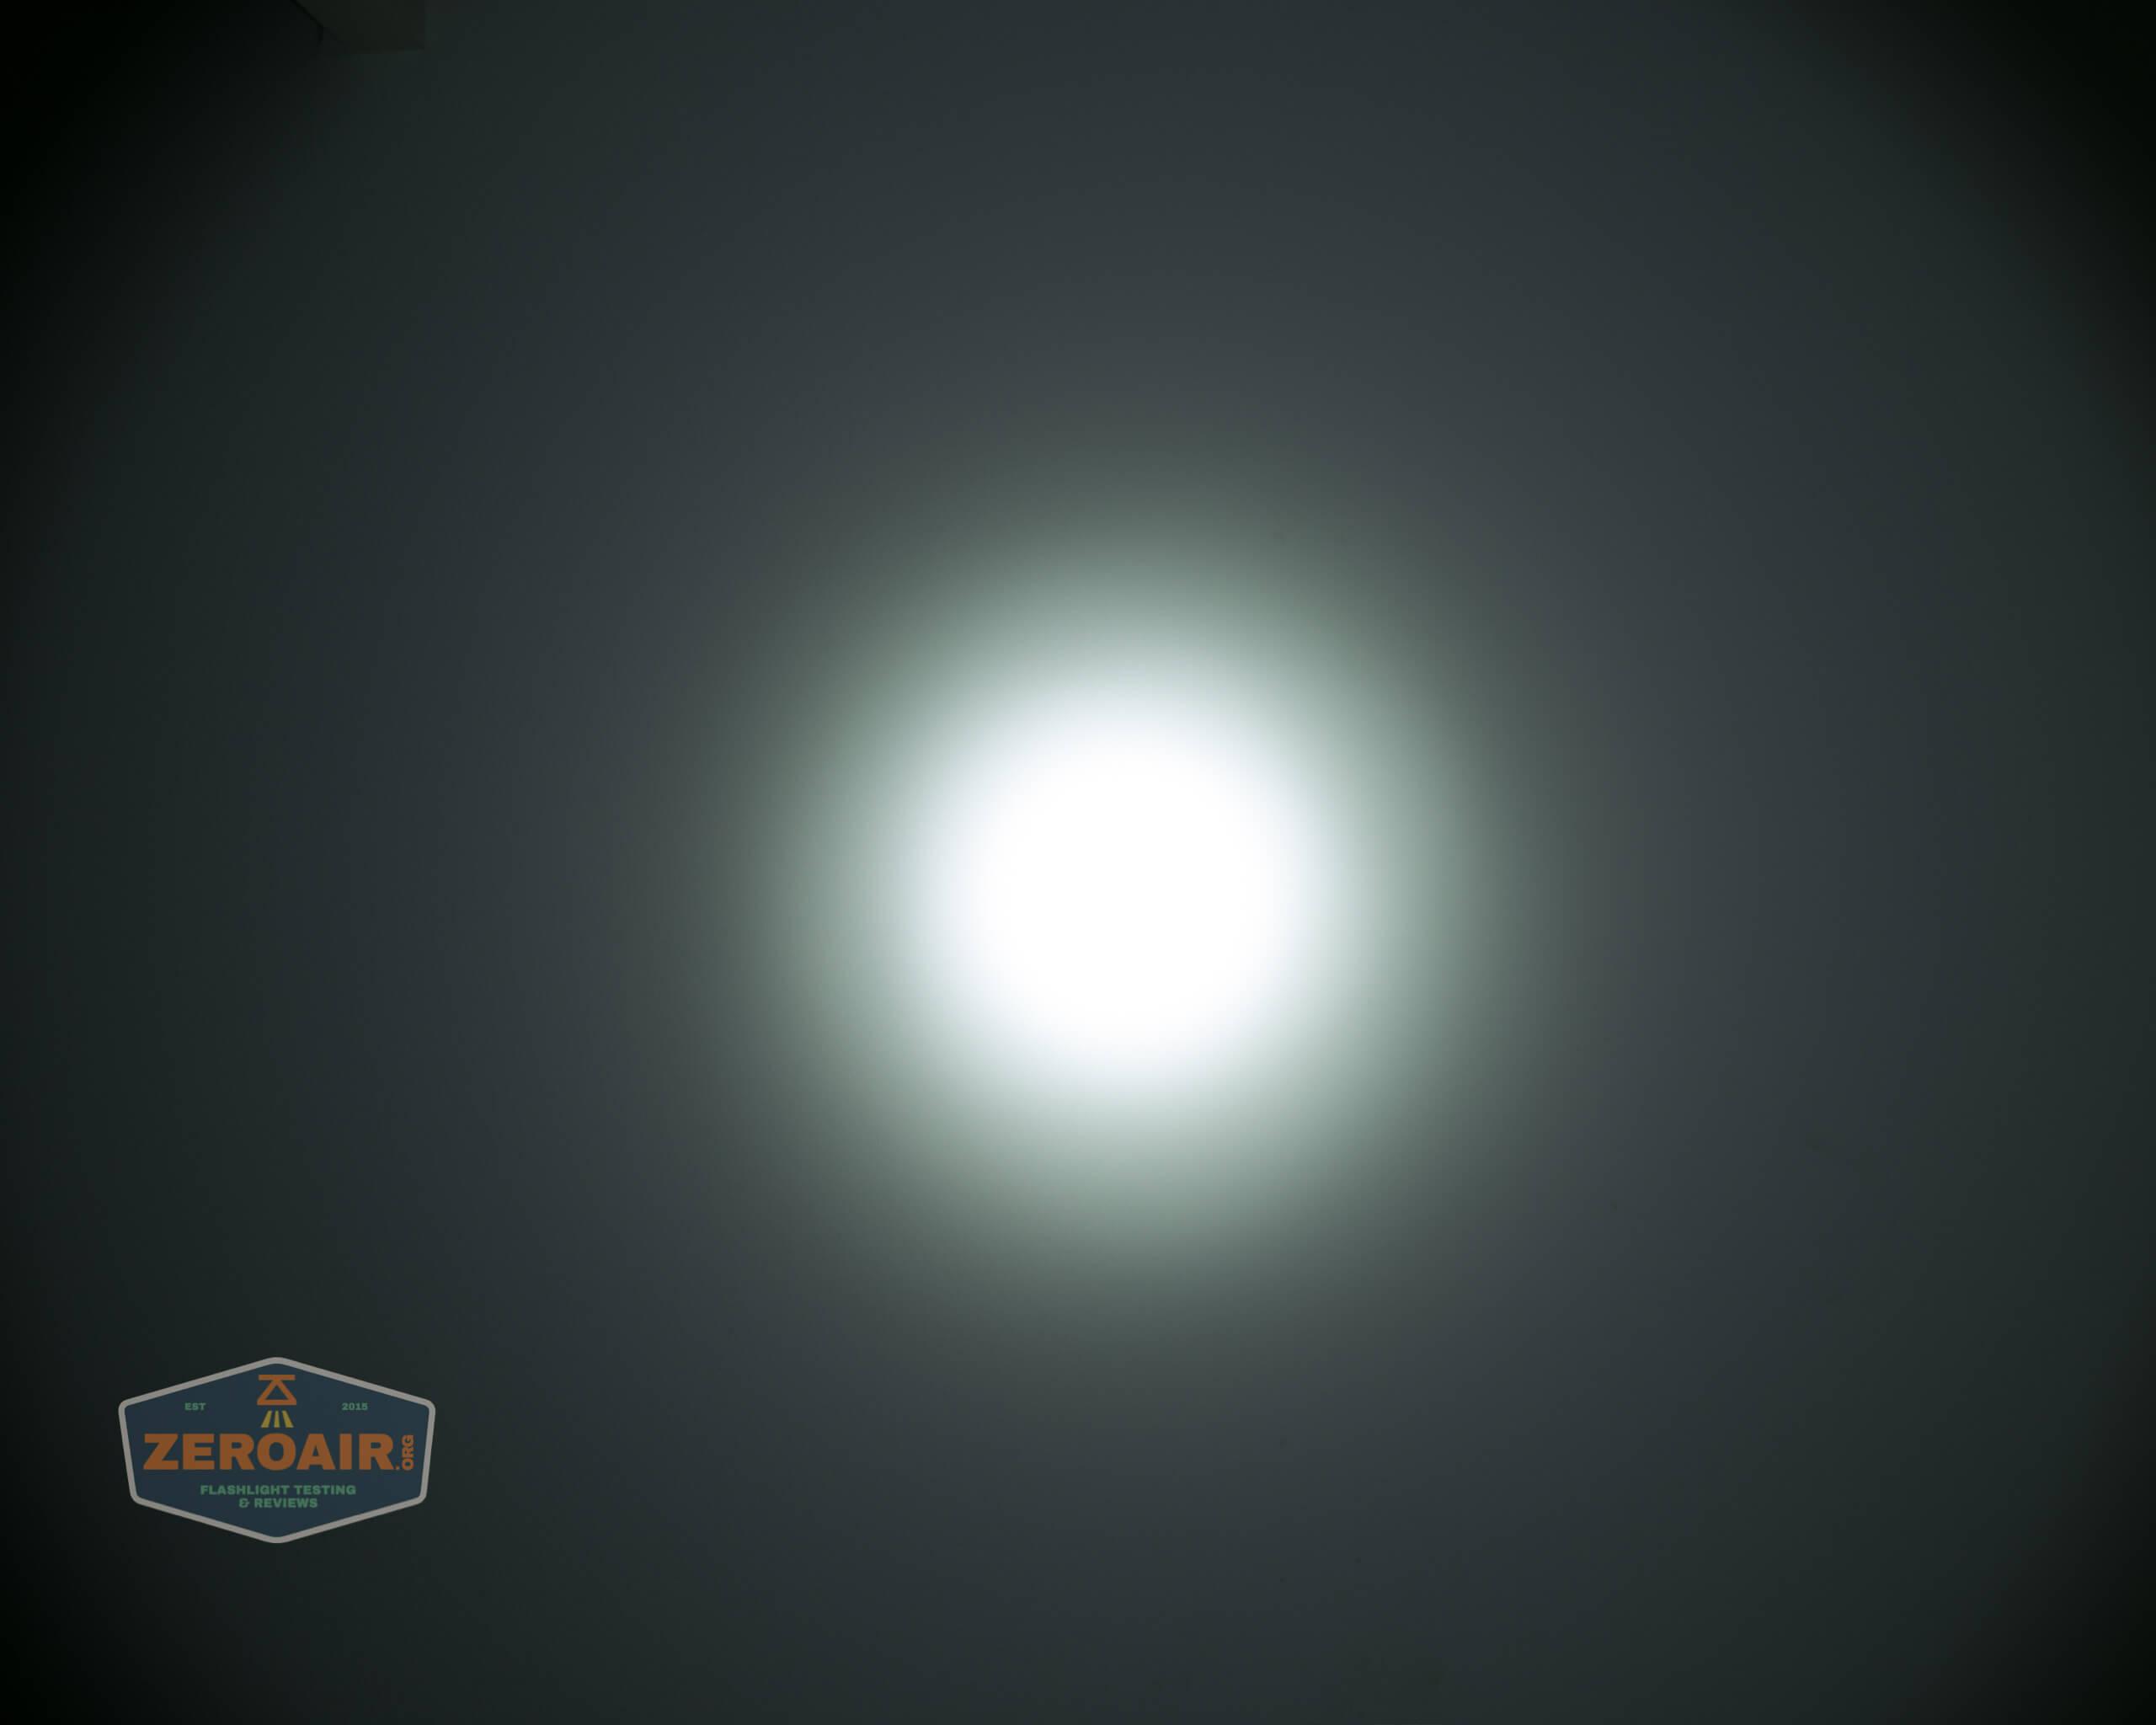 skilhunt m300 18650 flashlight beamshot ceiling 6